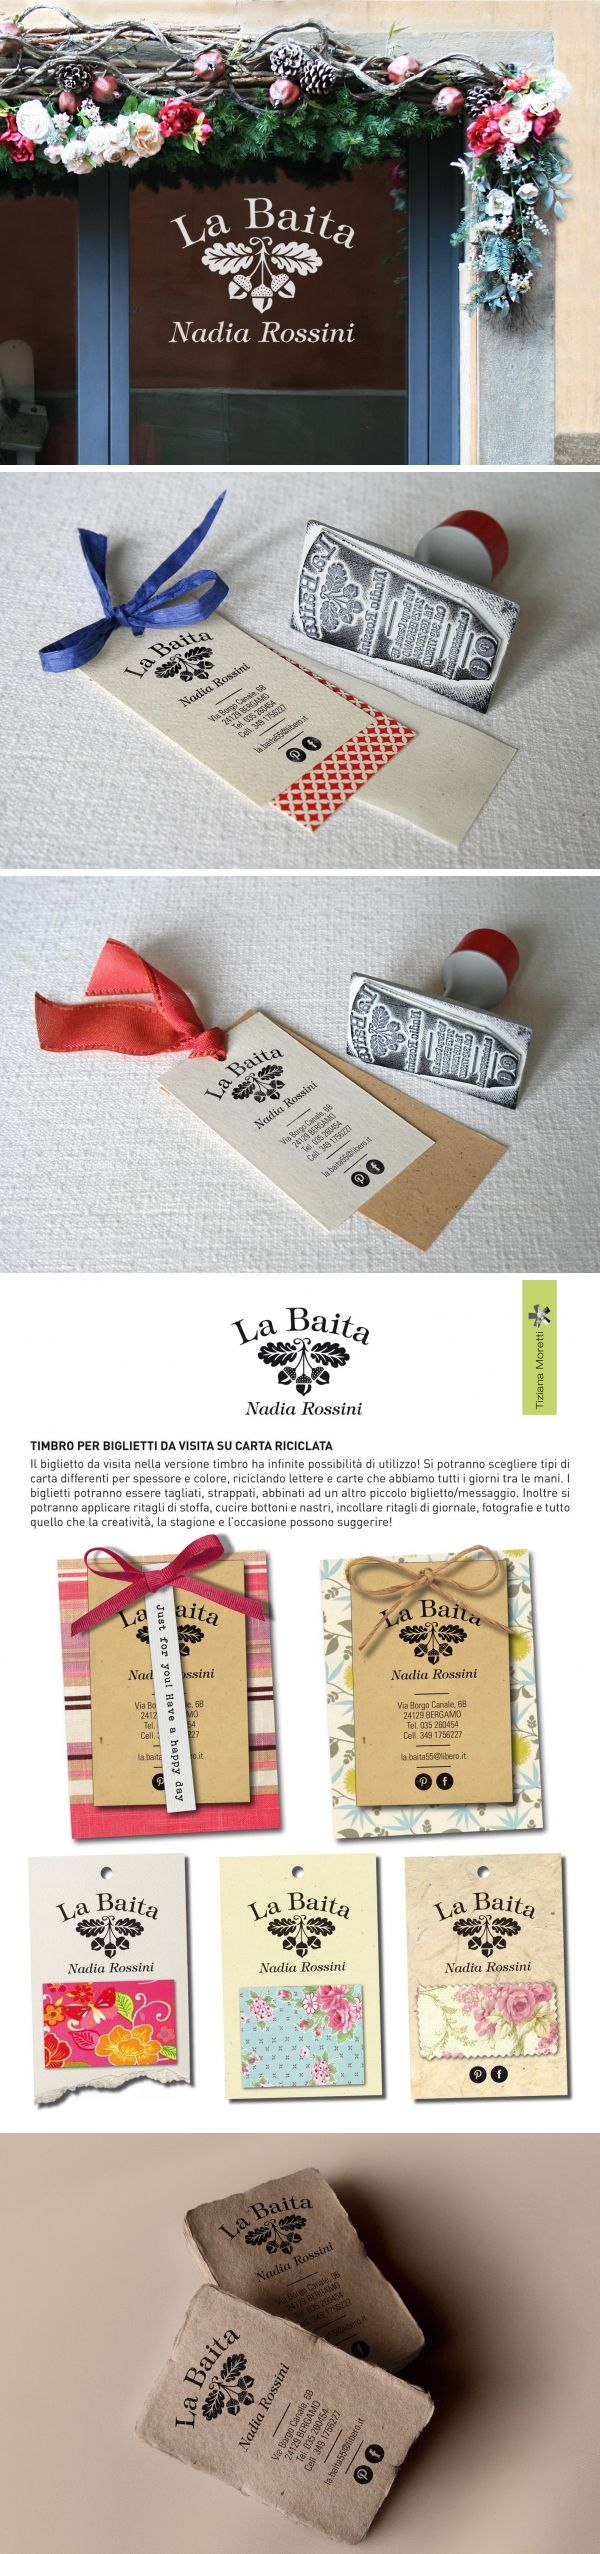 La Baita - Handcraft shop brand identity. Design by Tiziana Moretti. https://www.behance.net/gallery/26039941/La-Baita-Handcraft-shop-brand-identity